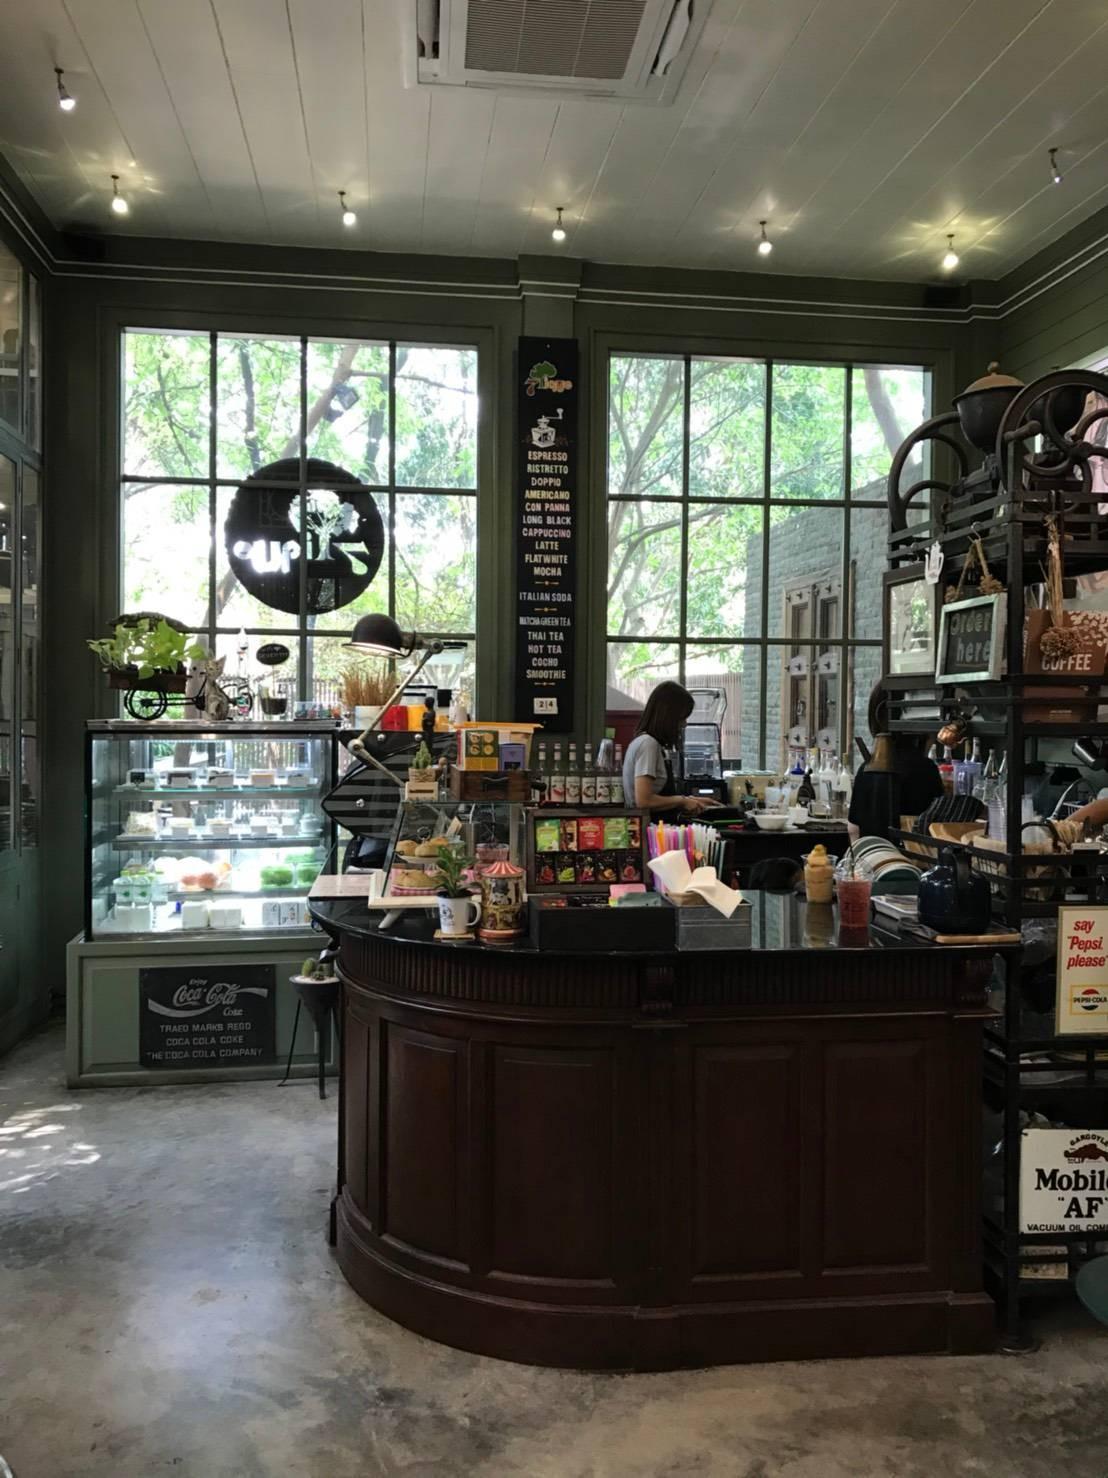 7tique coffee shop